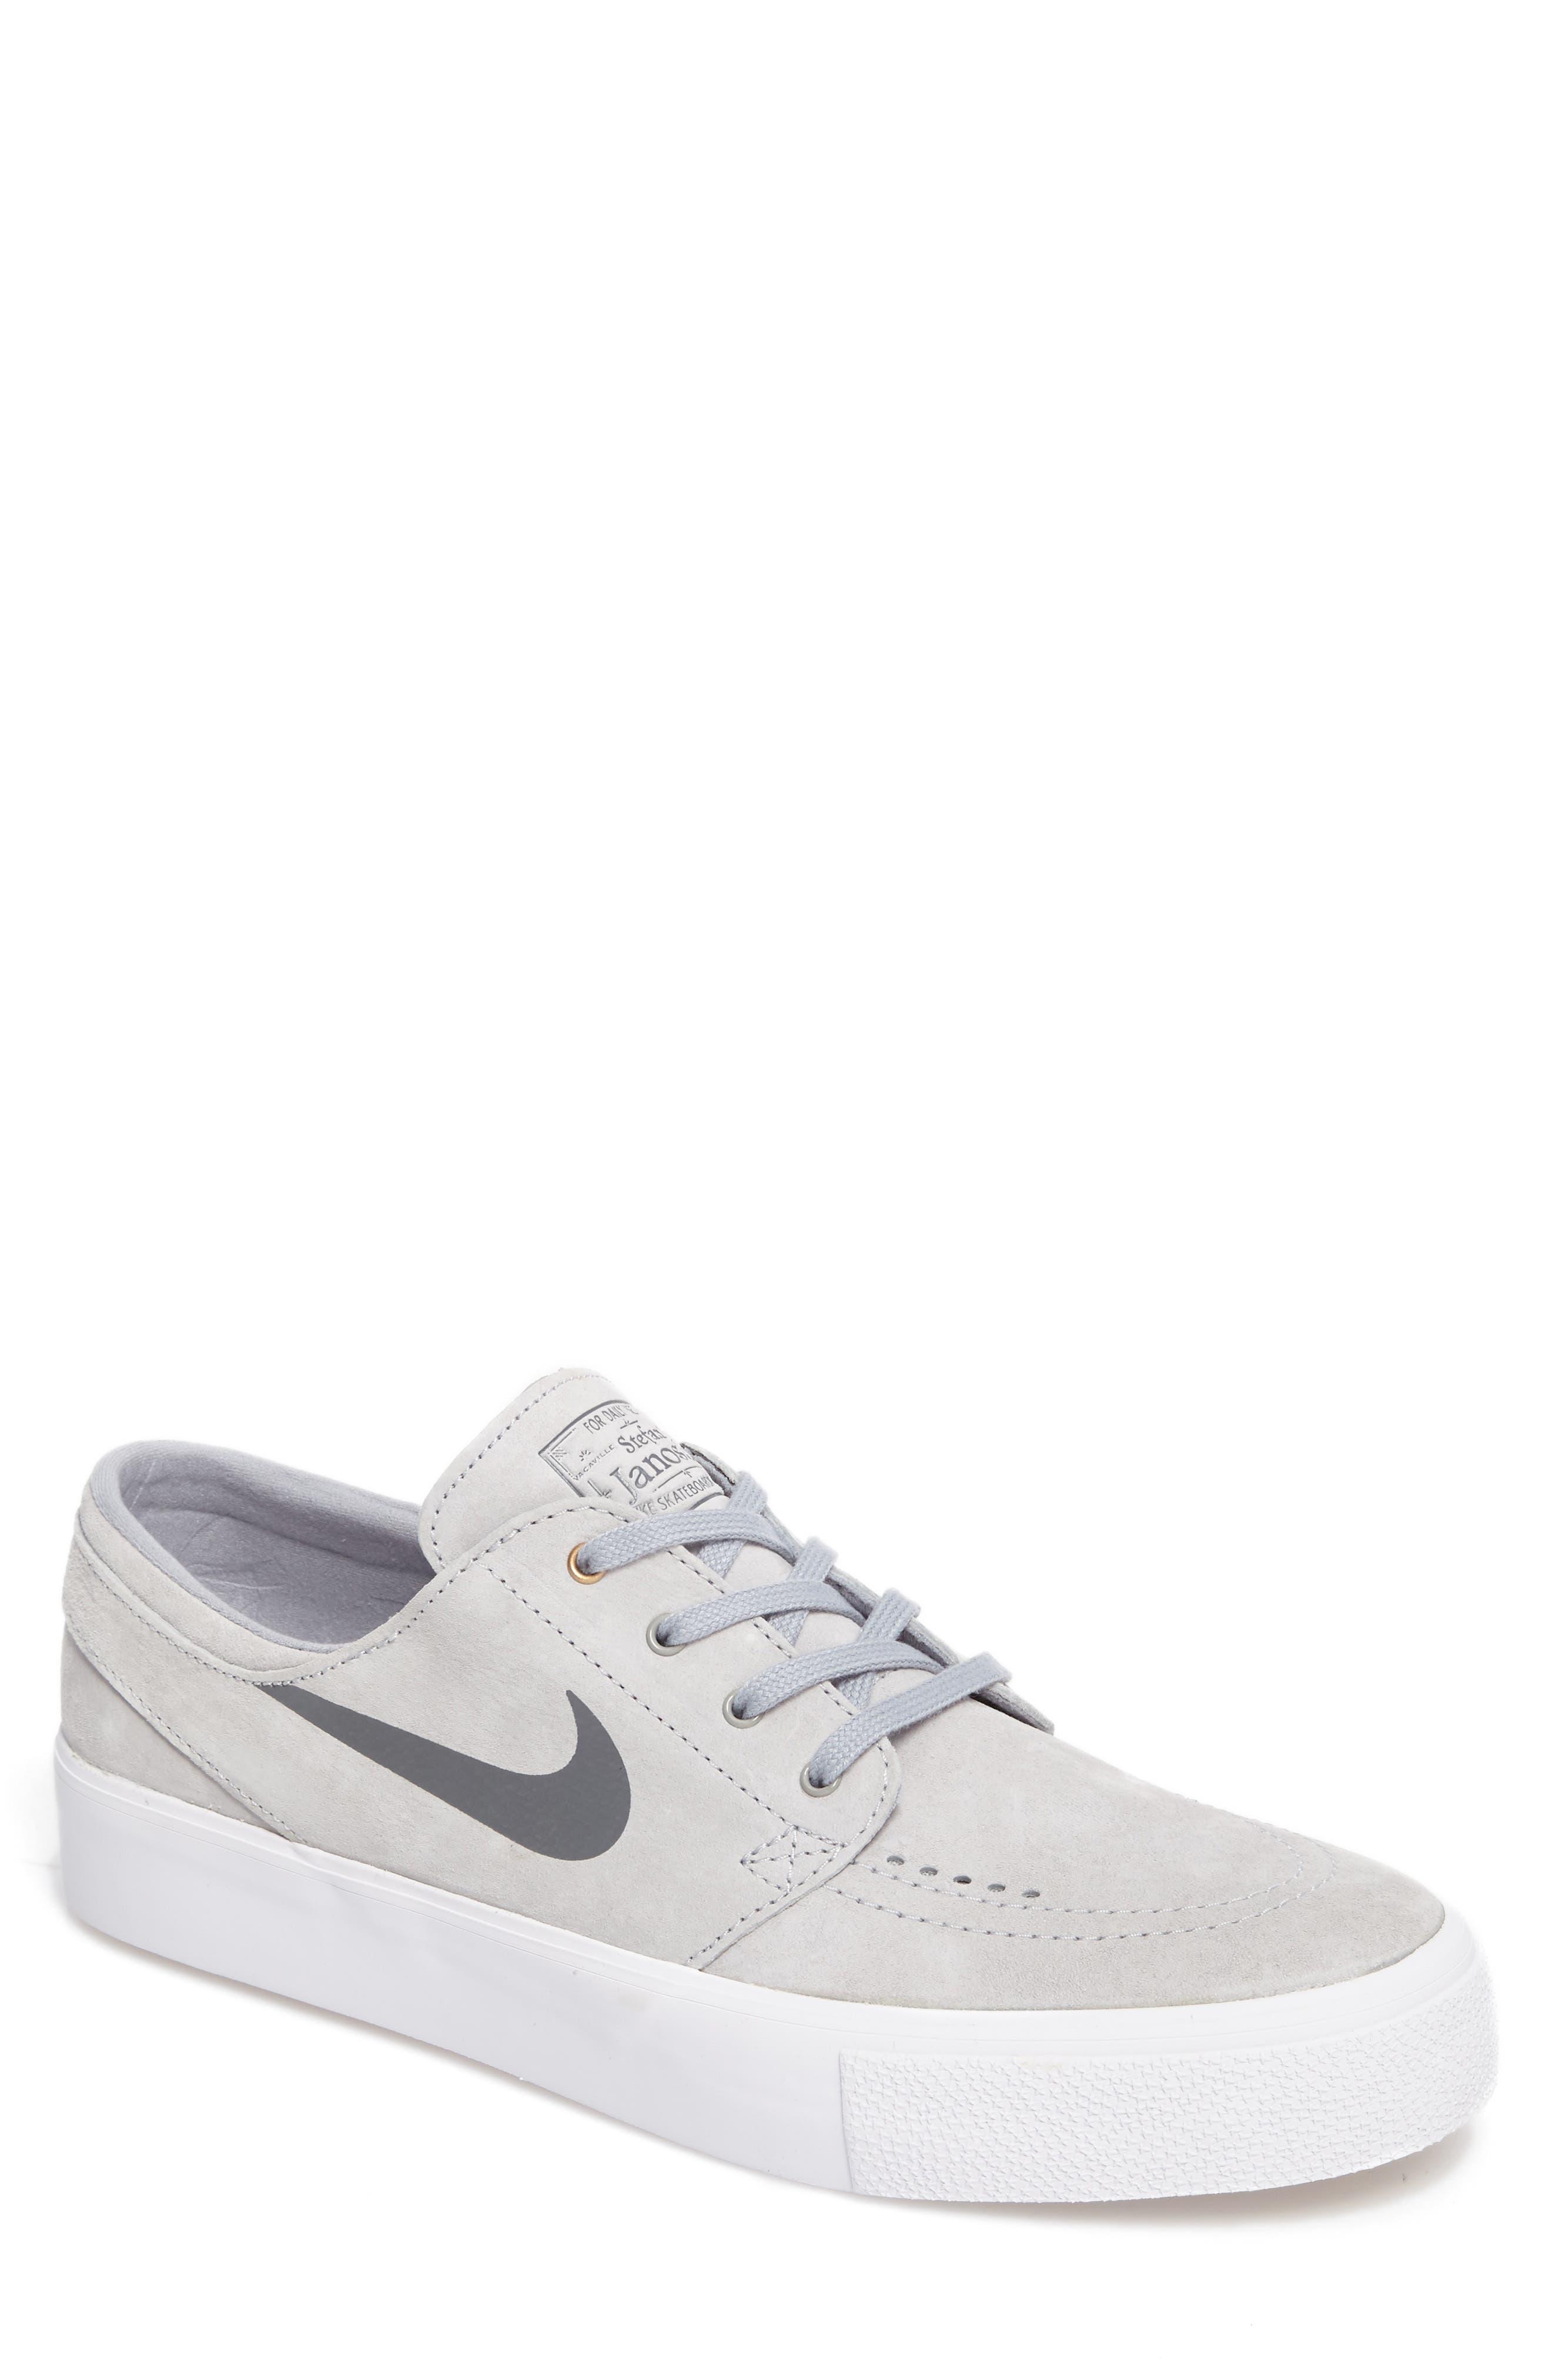 Main Image - Nike Zoom Stefan Janoski Premium Skate Sneaker (Men)